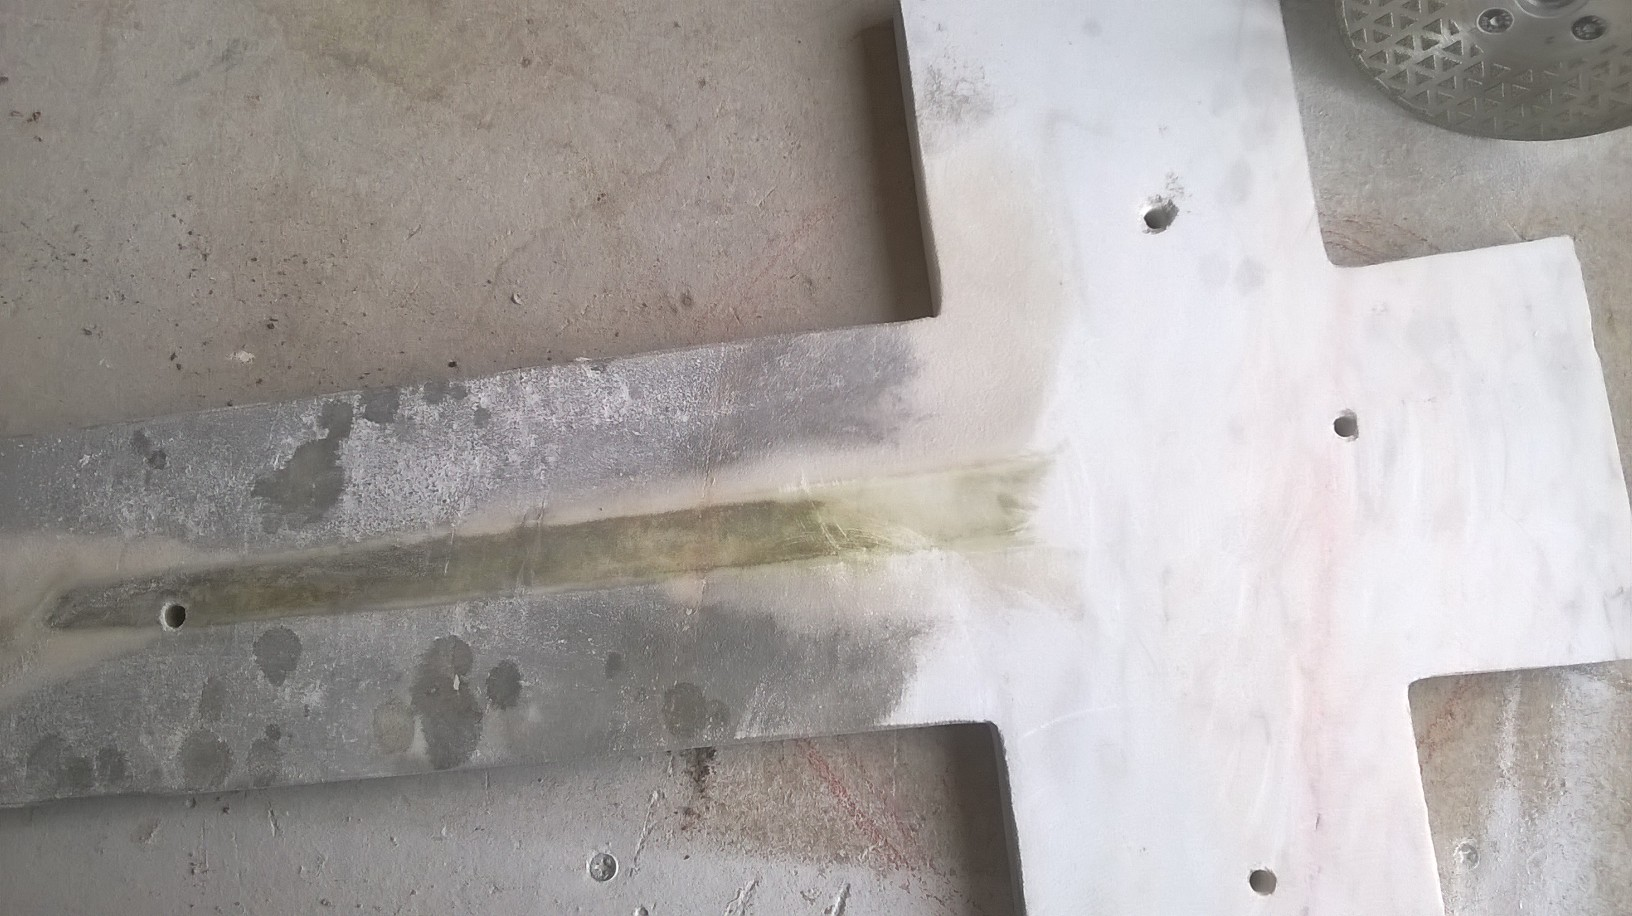 Ponçage du marbre